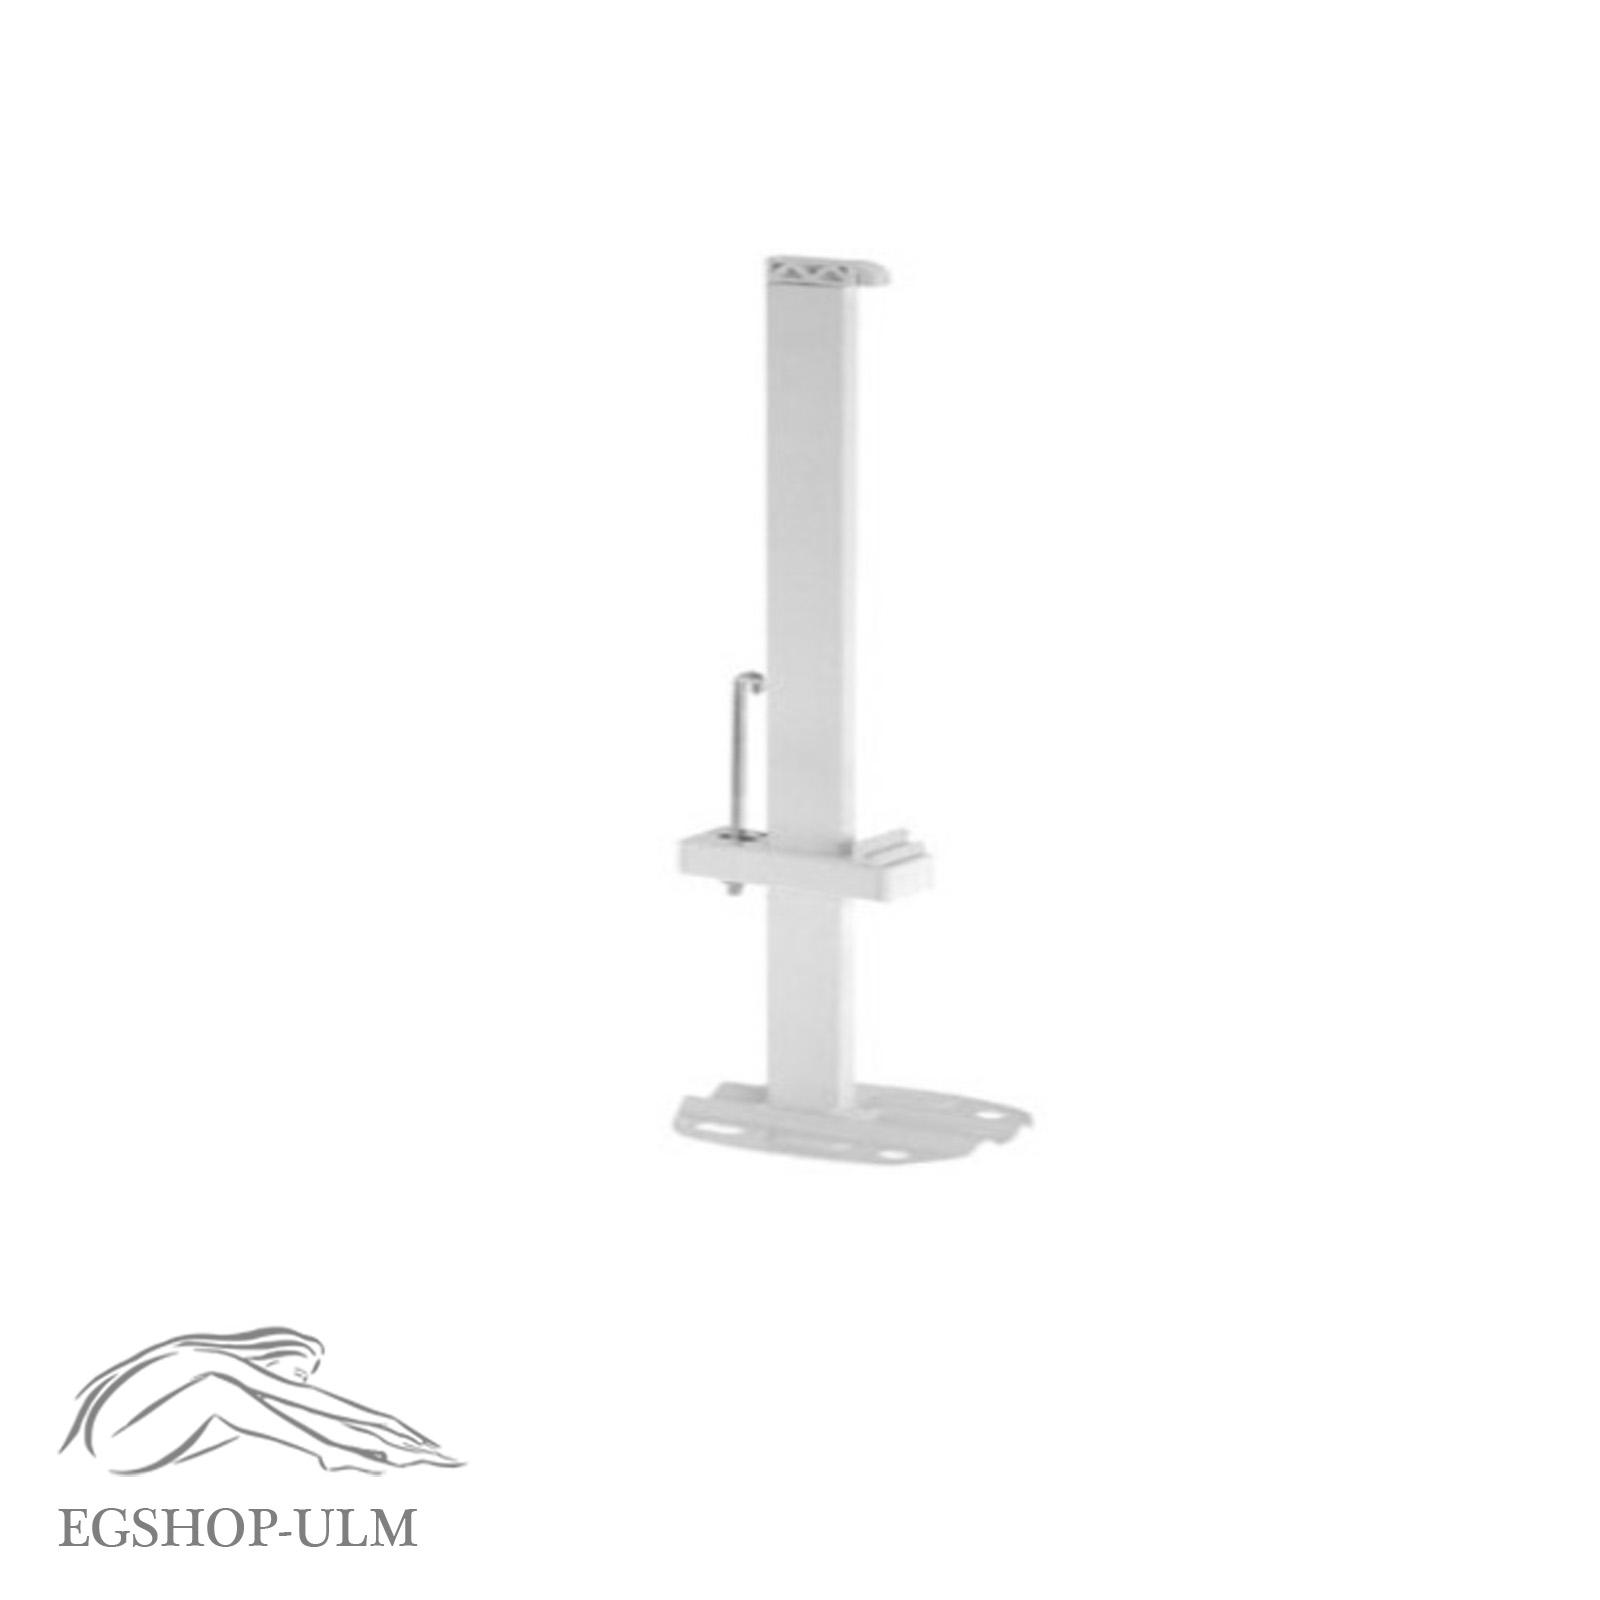 kermi standkonsole heizk rper standfu typ 11 33 bh 600. Black Bedroom Furniture Sets. Home Design Ideas